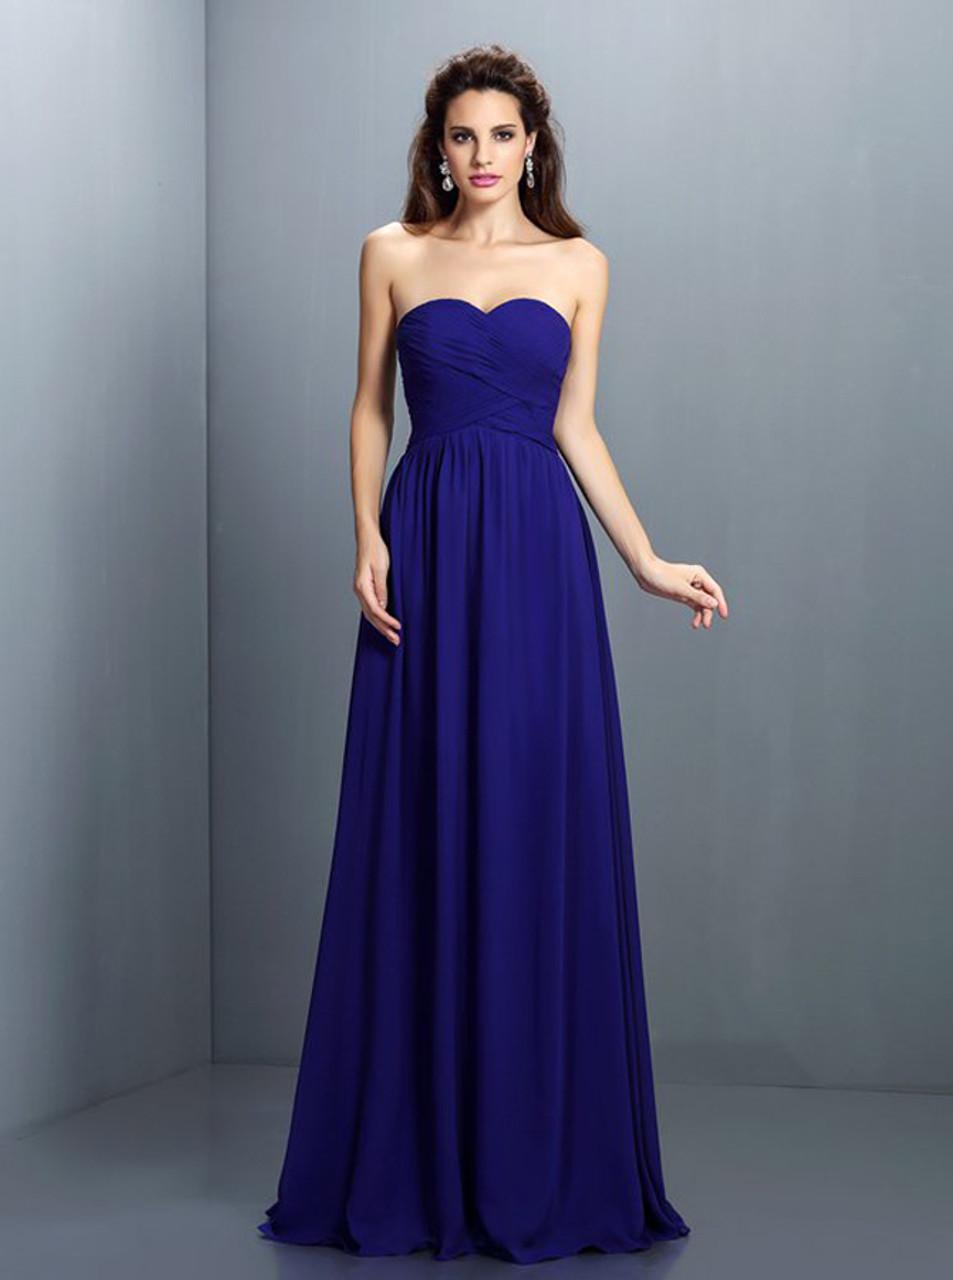 b04bc0d25cb Royal Blue Bridesmaid Dresses